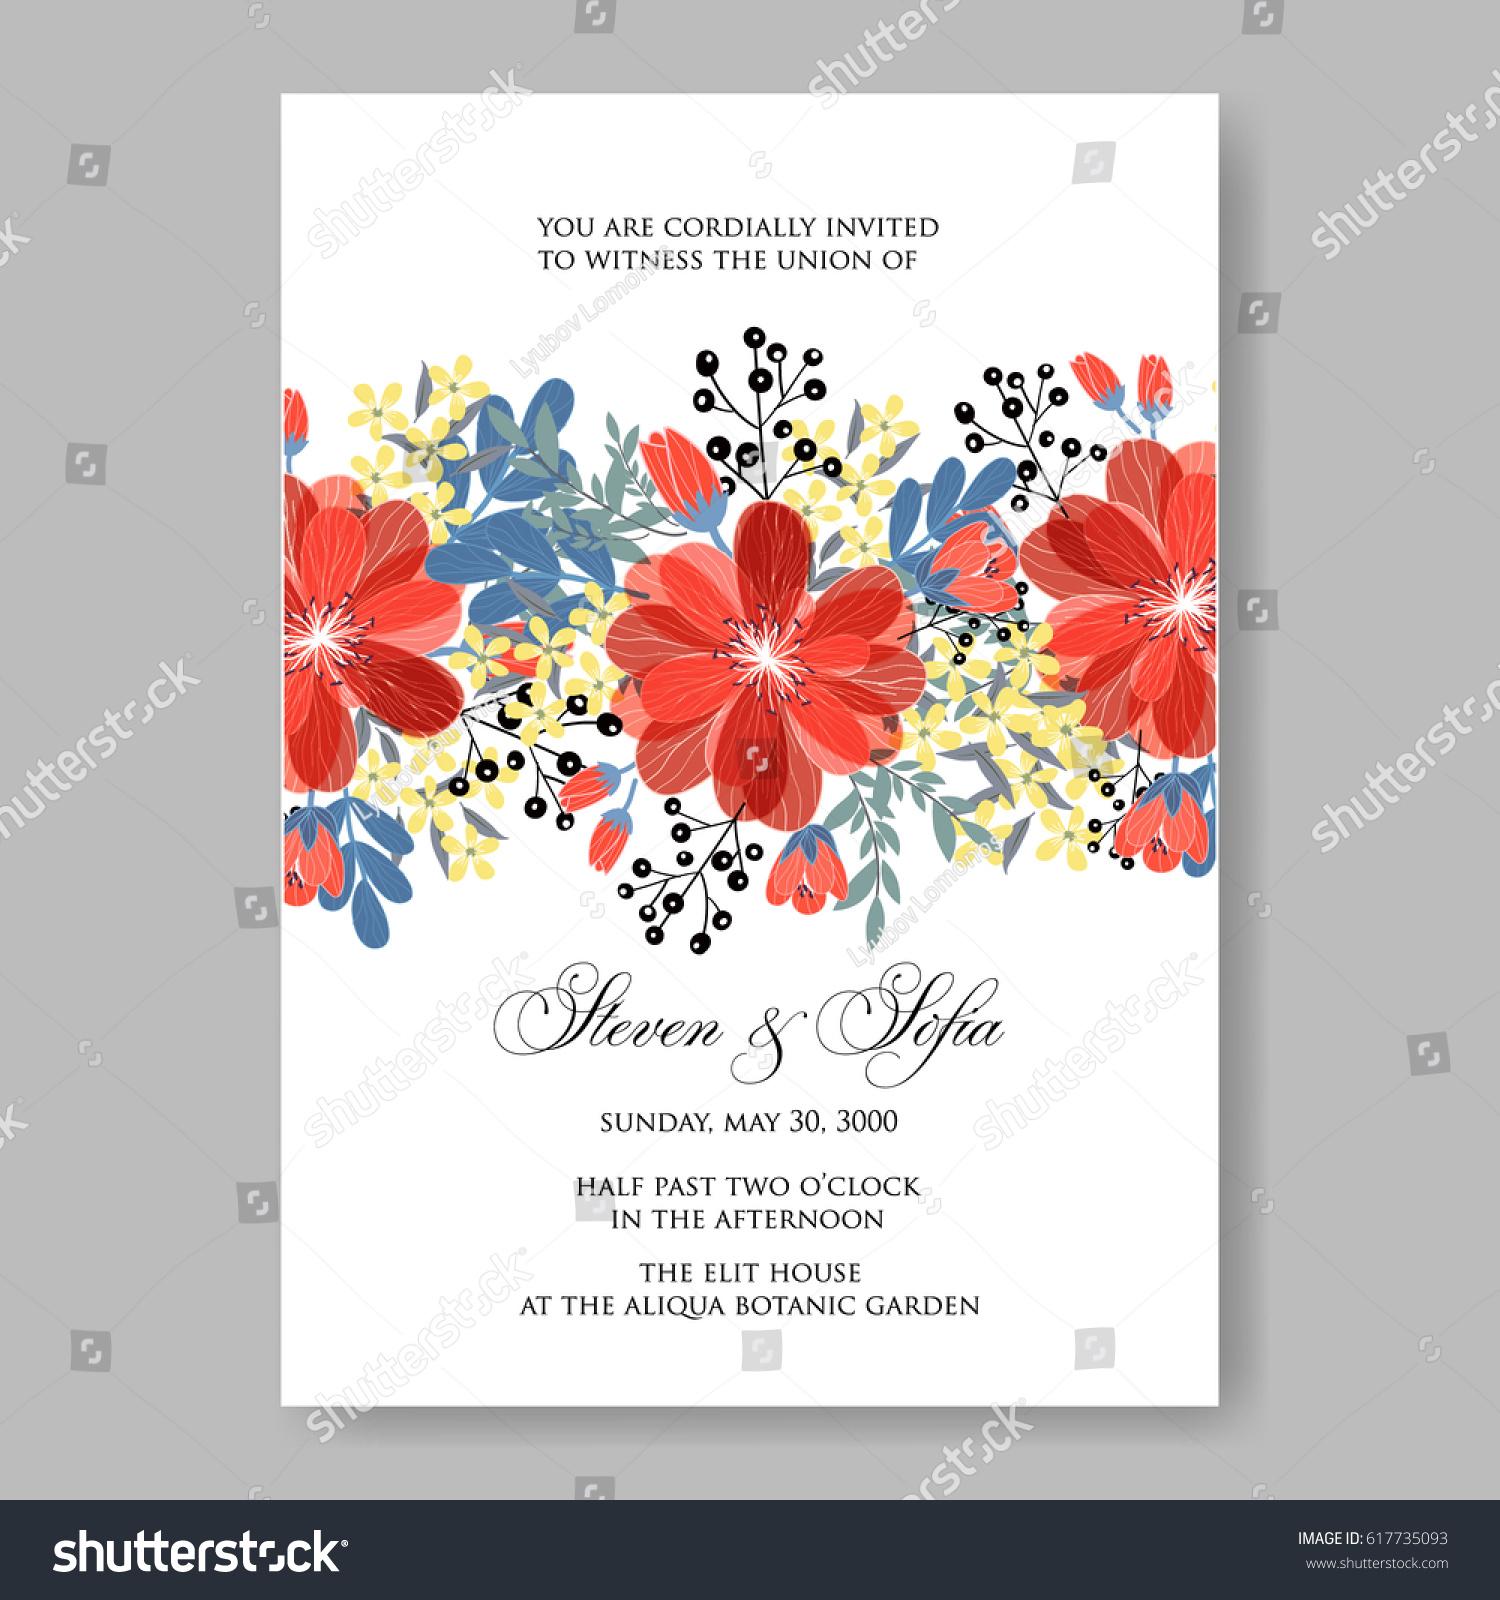 Wedding Invitation Card Template Red Dahlia Stock Vector (Royalty ...